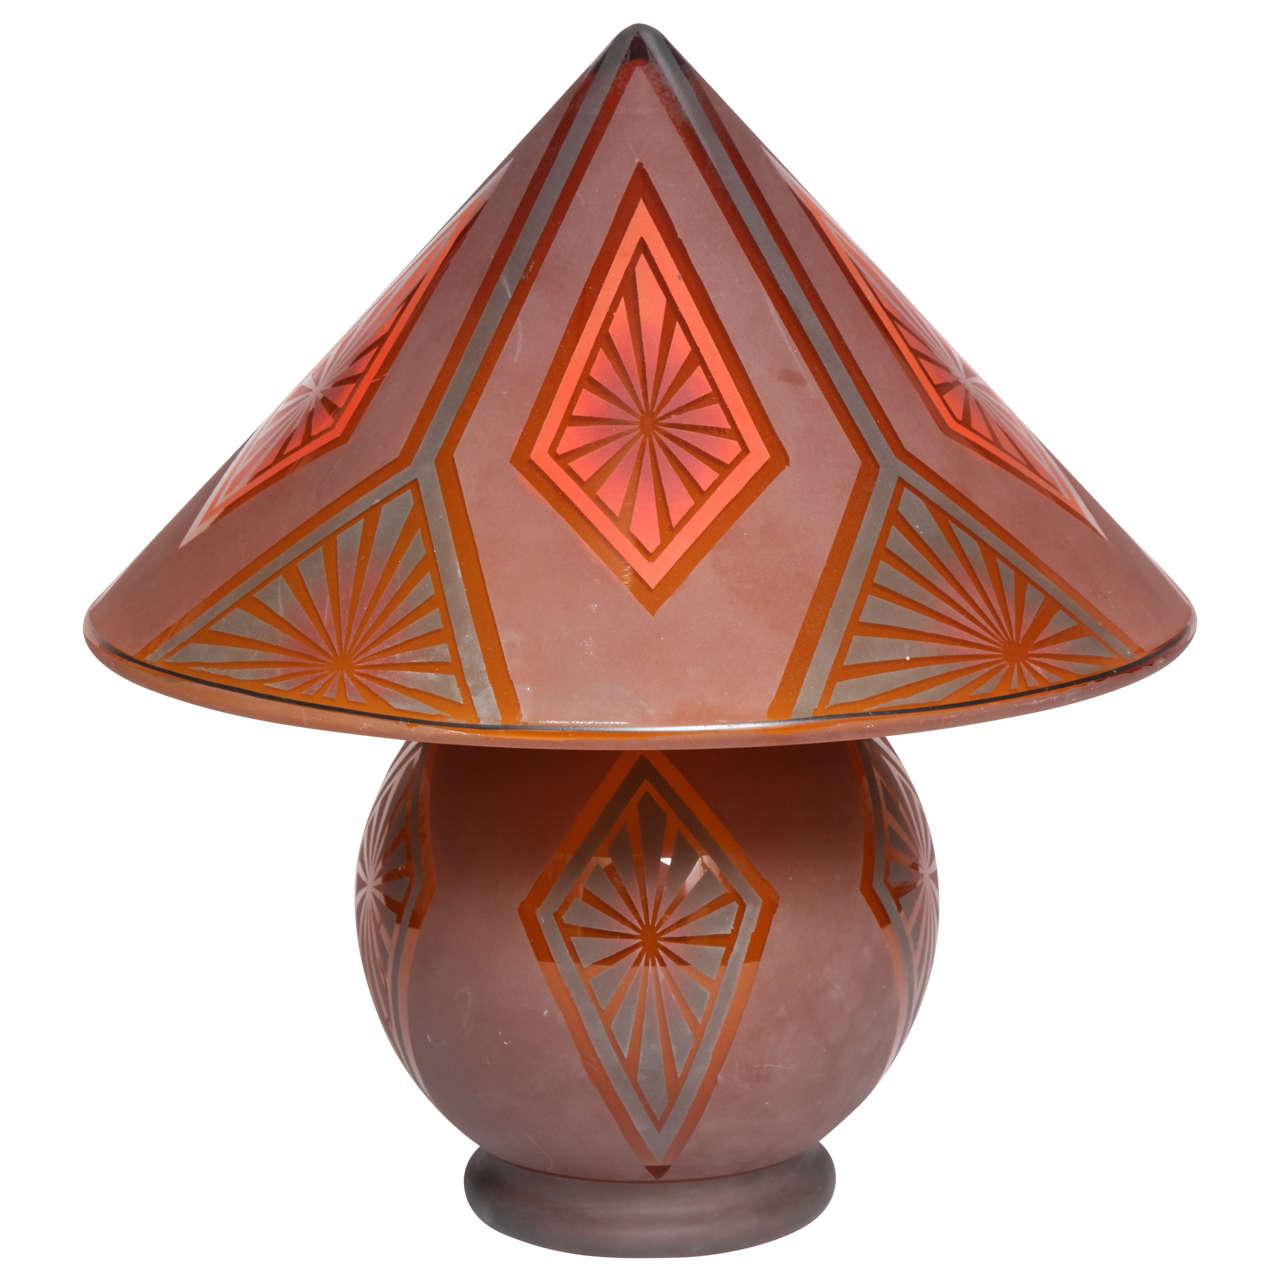 Bellova glass art deco table lamp circa 1925 czechoslovakia for bellova glass art deco table lamp circa 1925 czechoslovakia 1 geotapseo Images